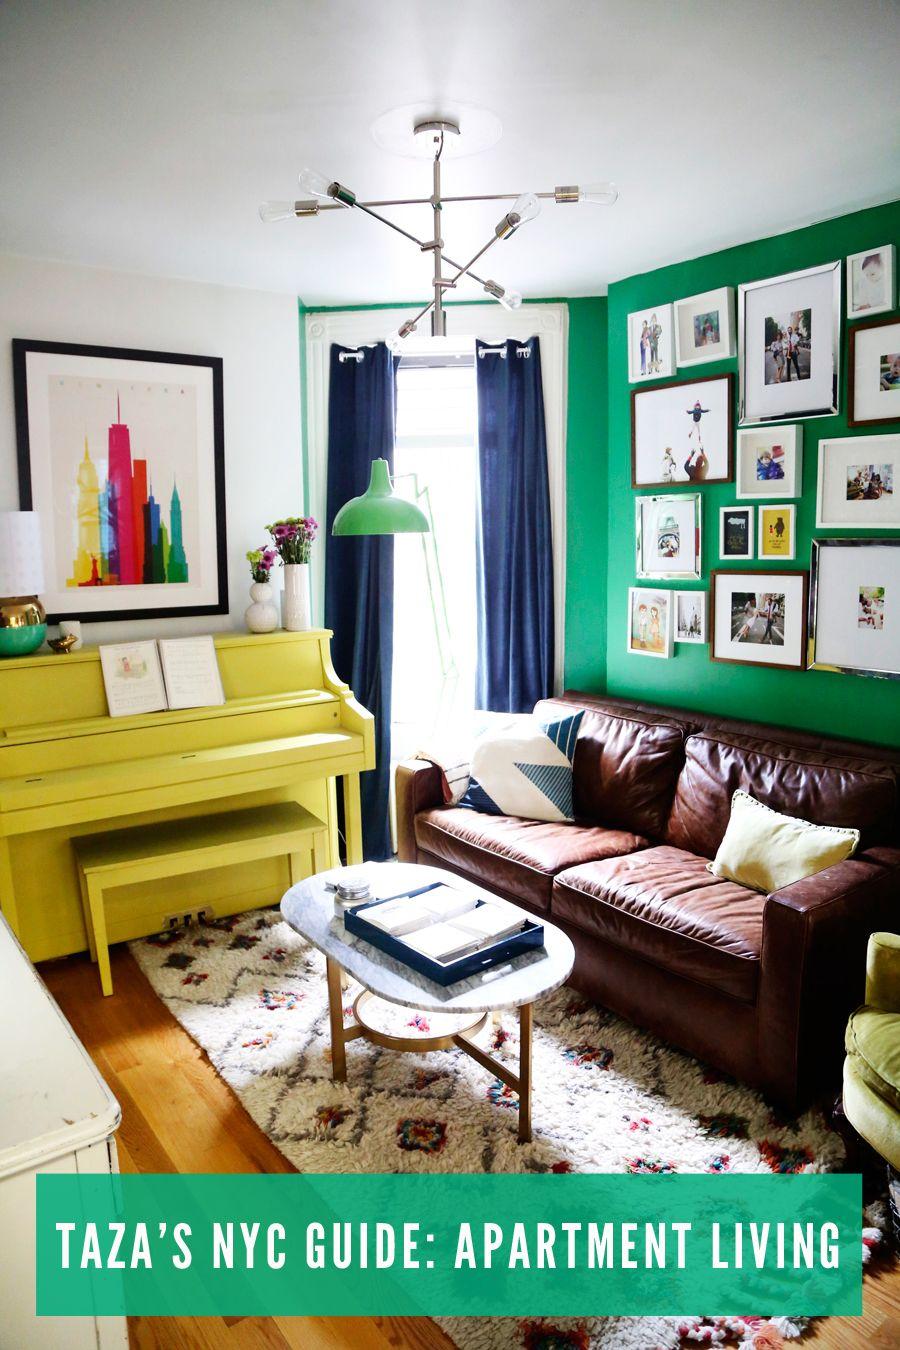 Apartment Design Guide taza's nyc guide: urban living! (love taza | apartments, apartment